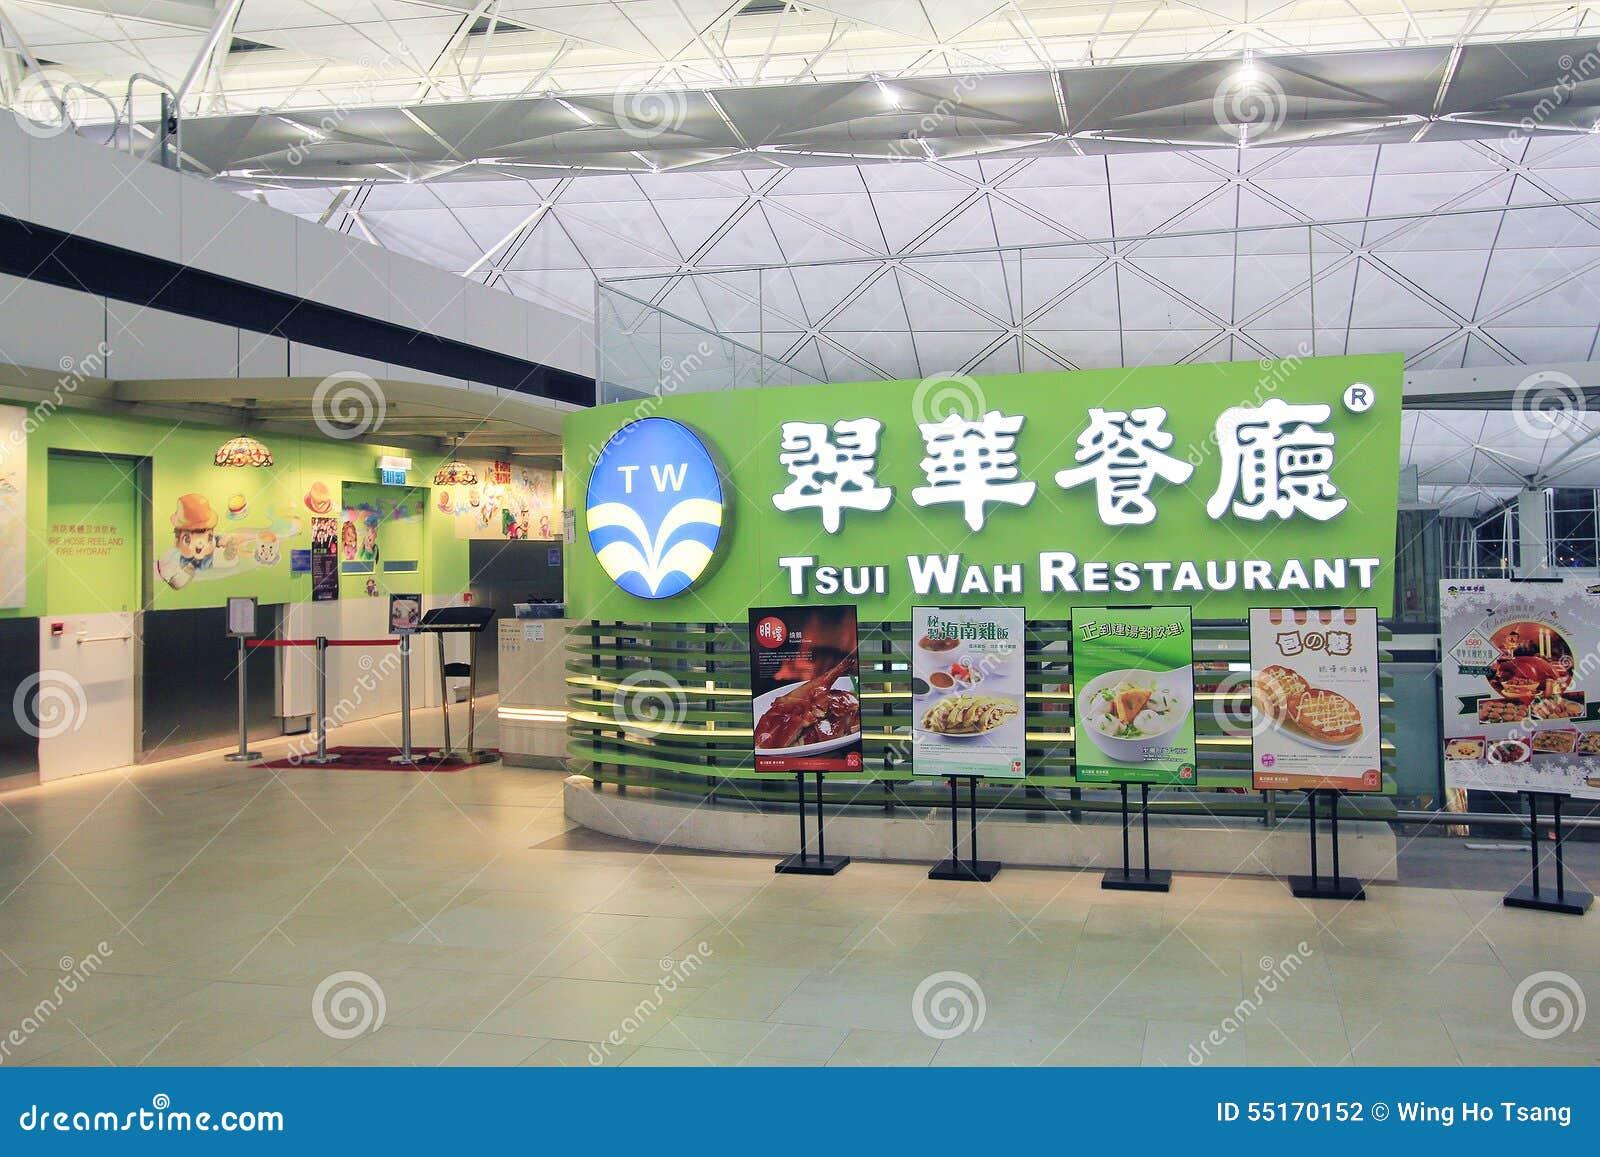 Tsui Wah Restaurant Airport>